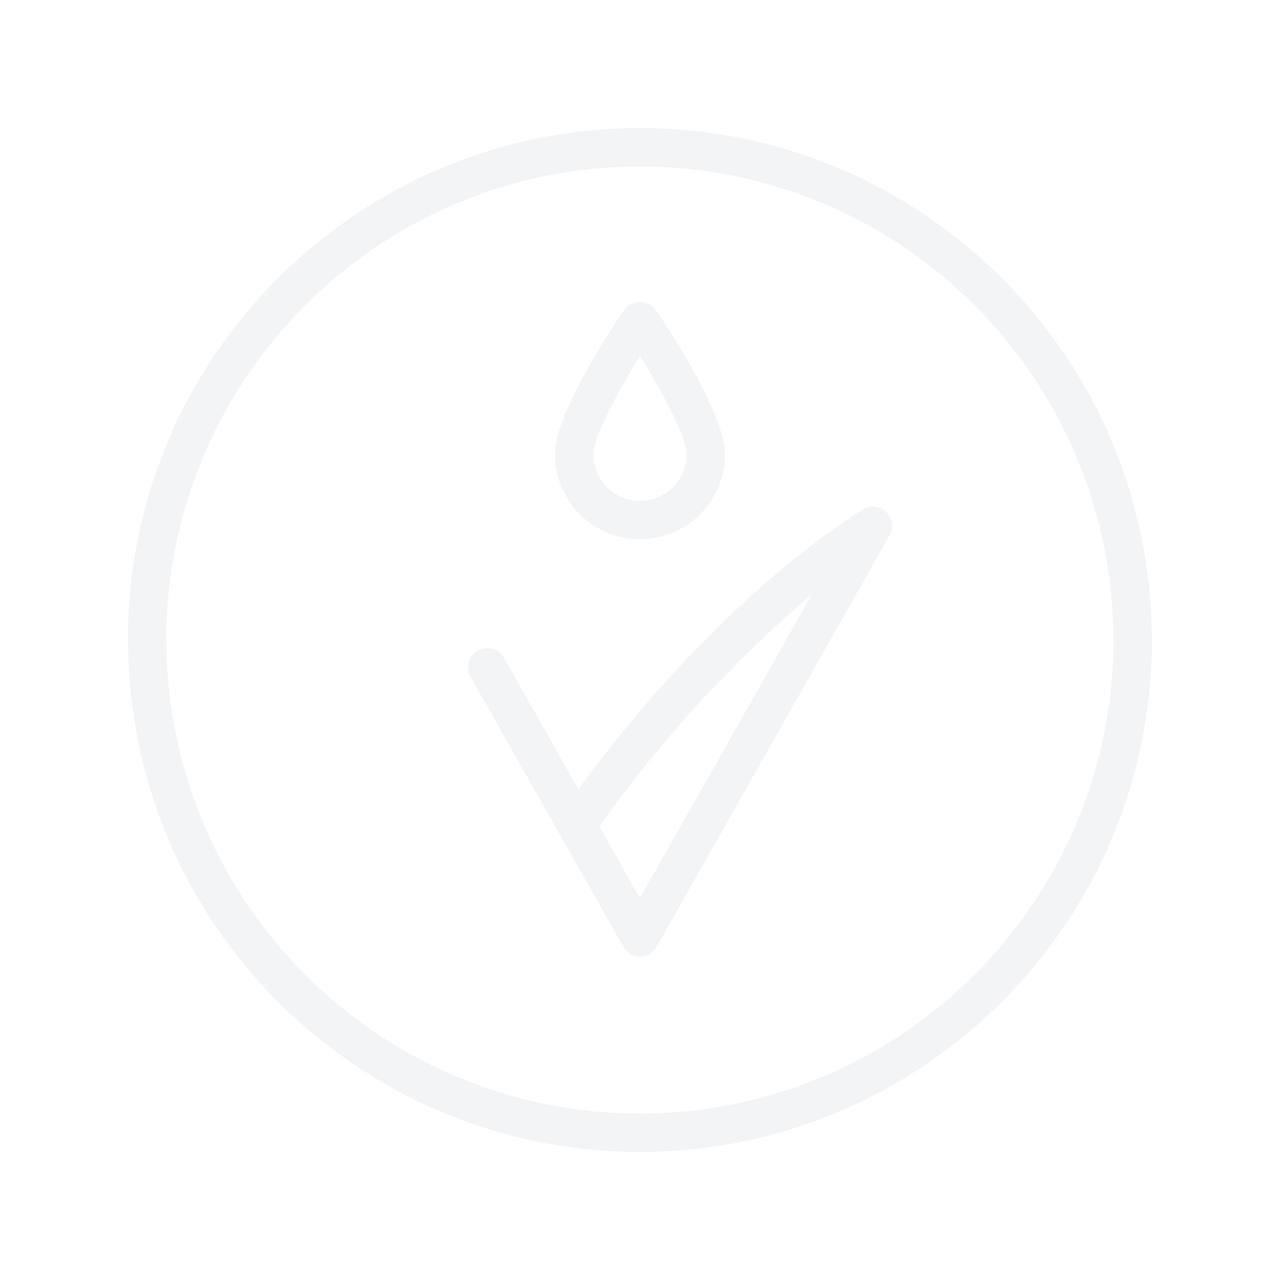 MIZON Joyful Time Essence Herb Mask 23g травяная маска для лица